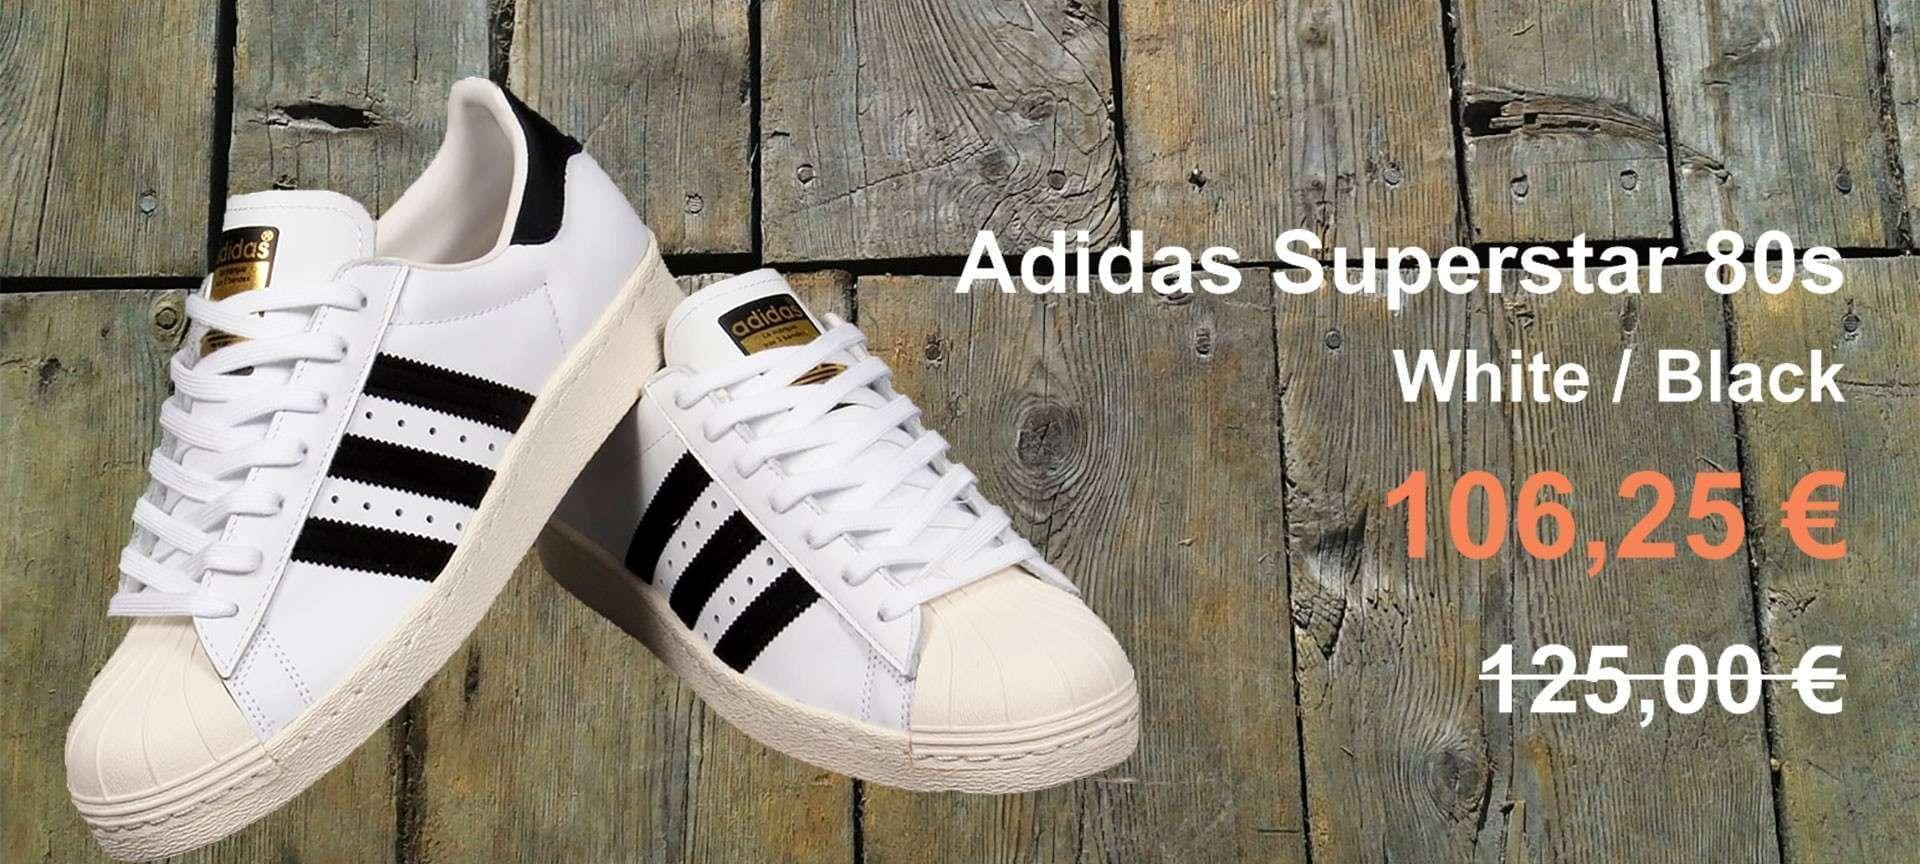 Scarpe Adidas Superstar 80s bianco/Nero